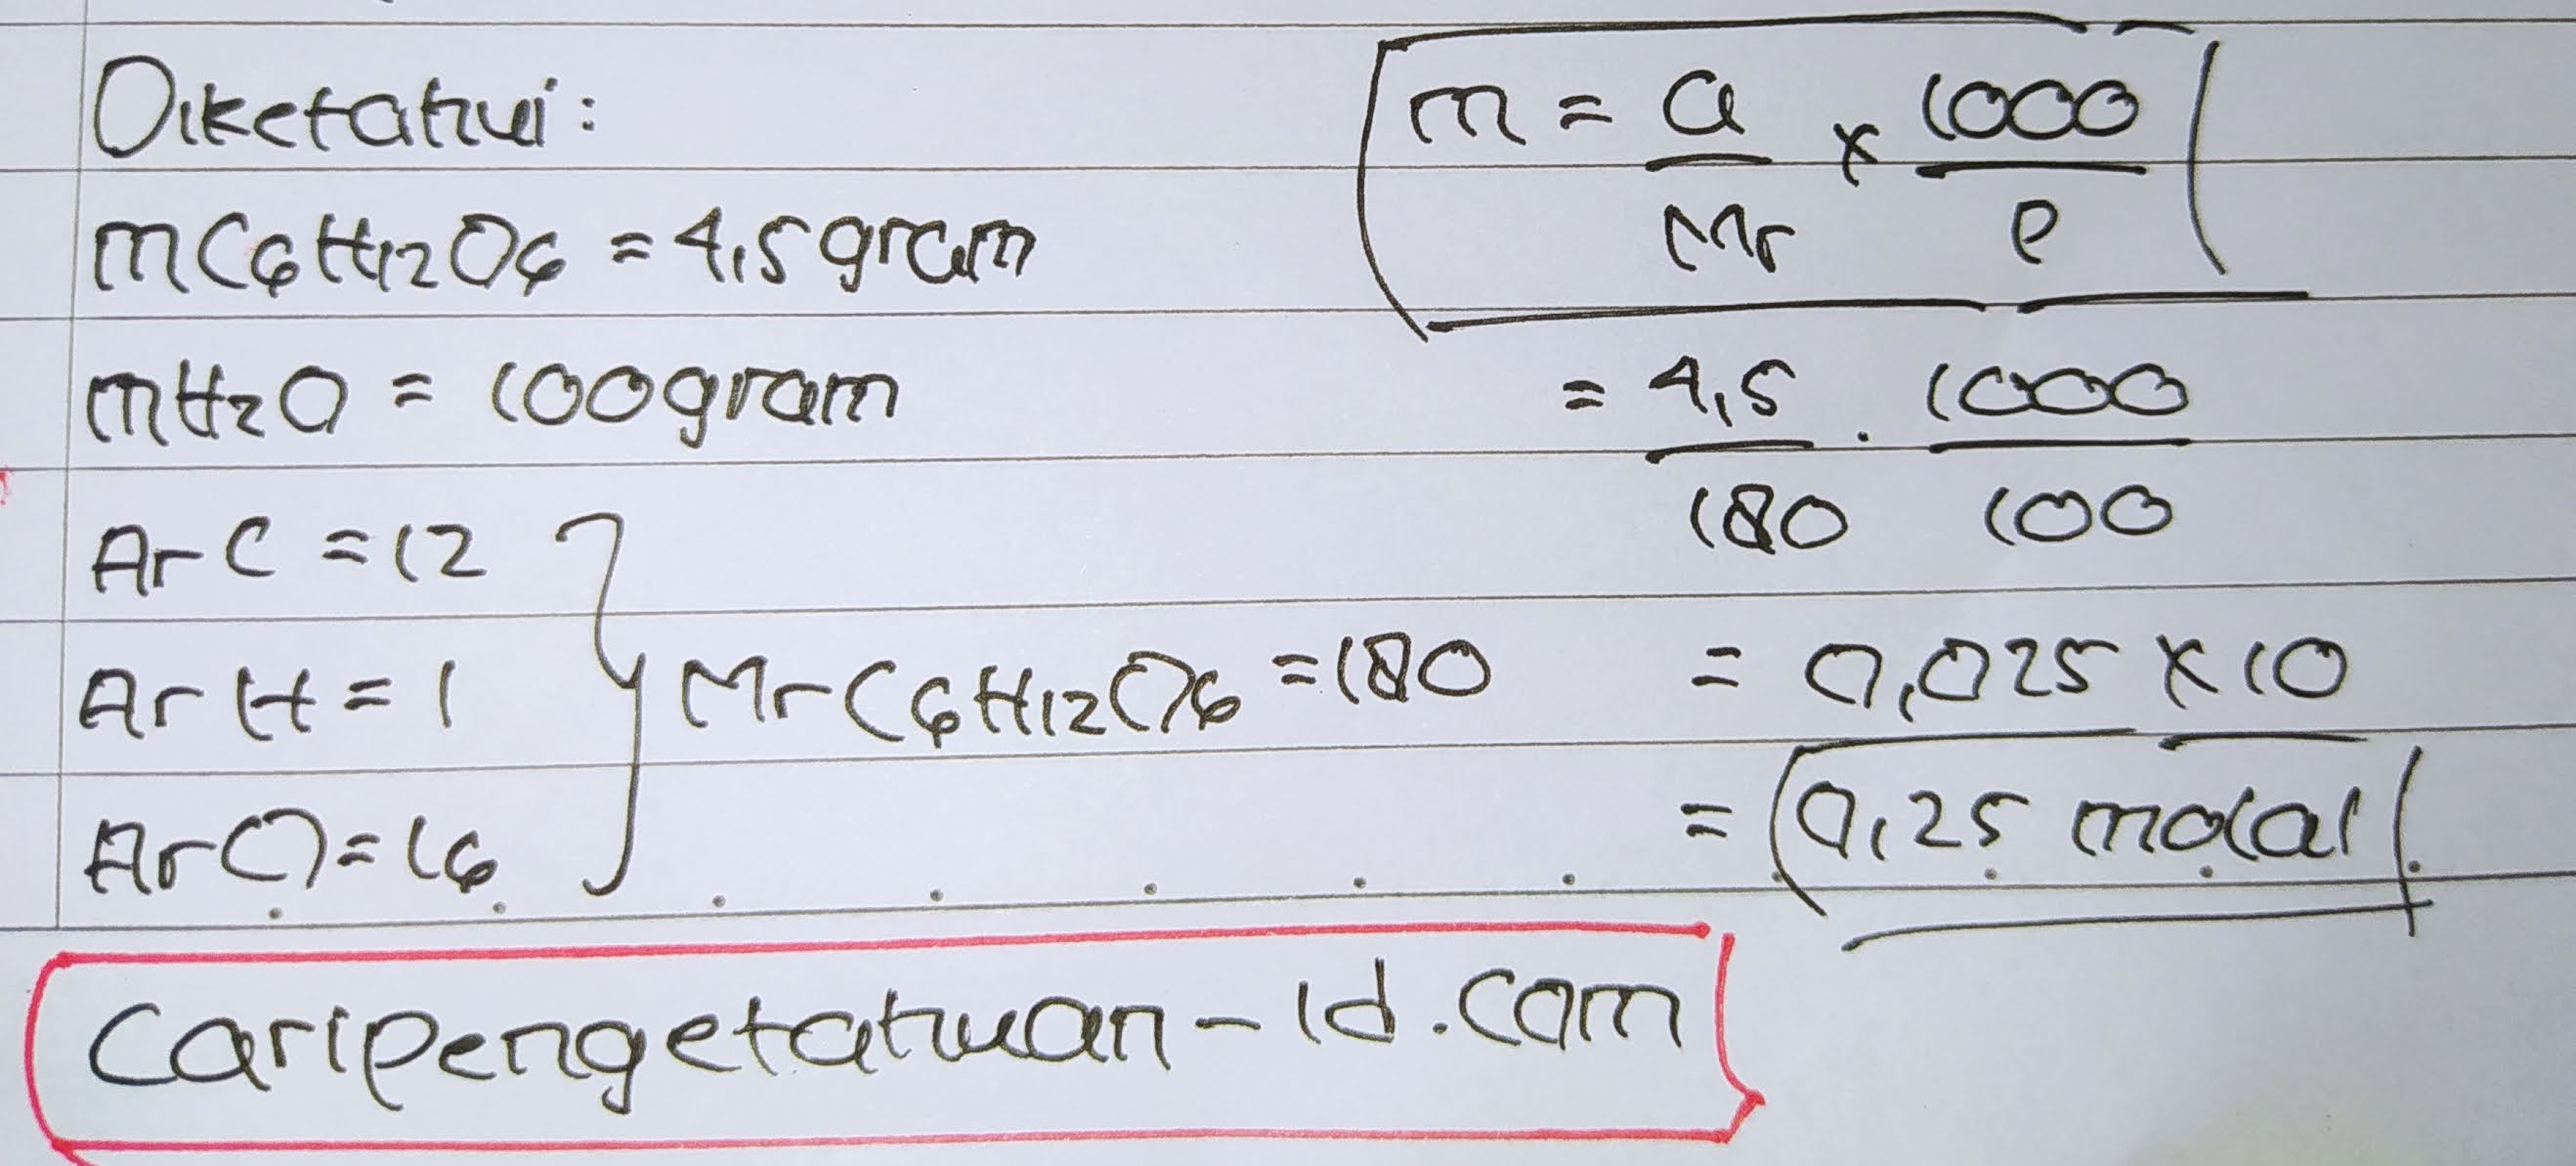 Jika didalam suatu larutan yang dibuat dengan melarutkan 4,5 gram glukosa (C6H12O6) dalam 100 gram air, kemolalannya adalah …. (Ar C = 12, H = 1, O = 16)